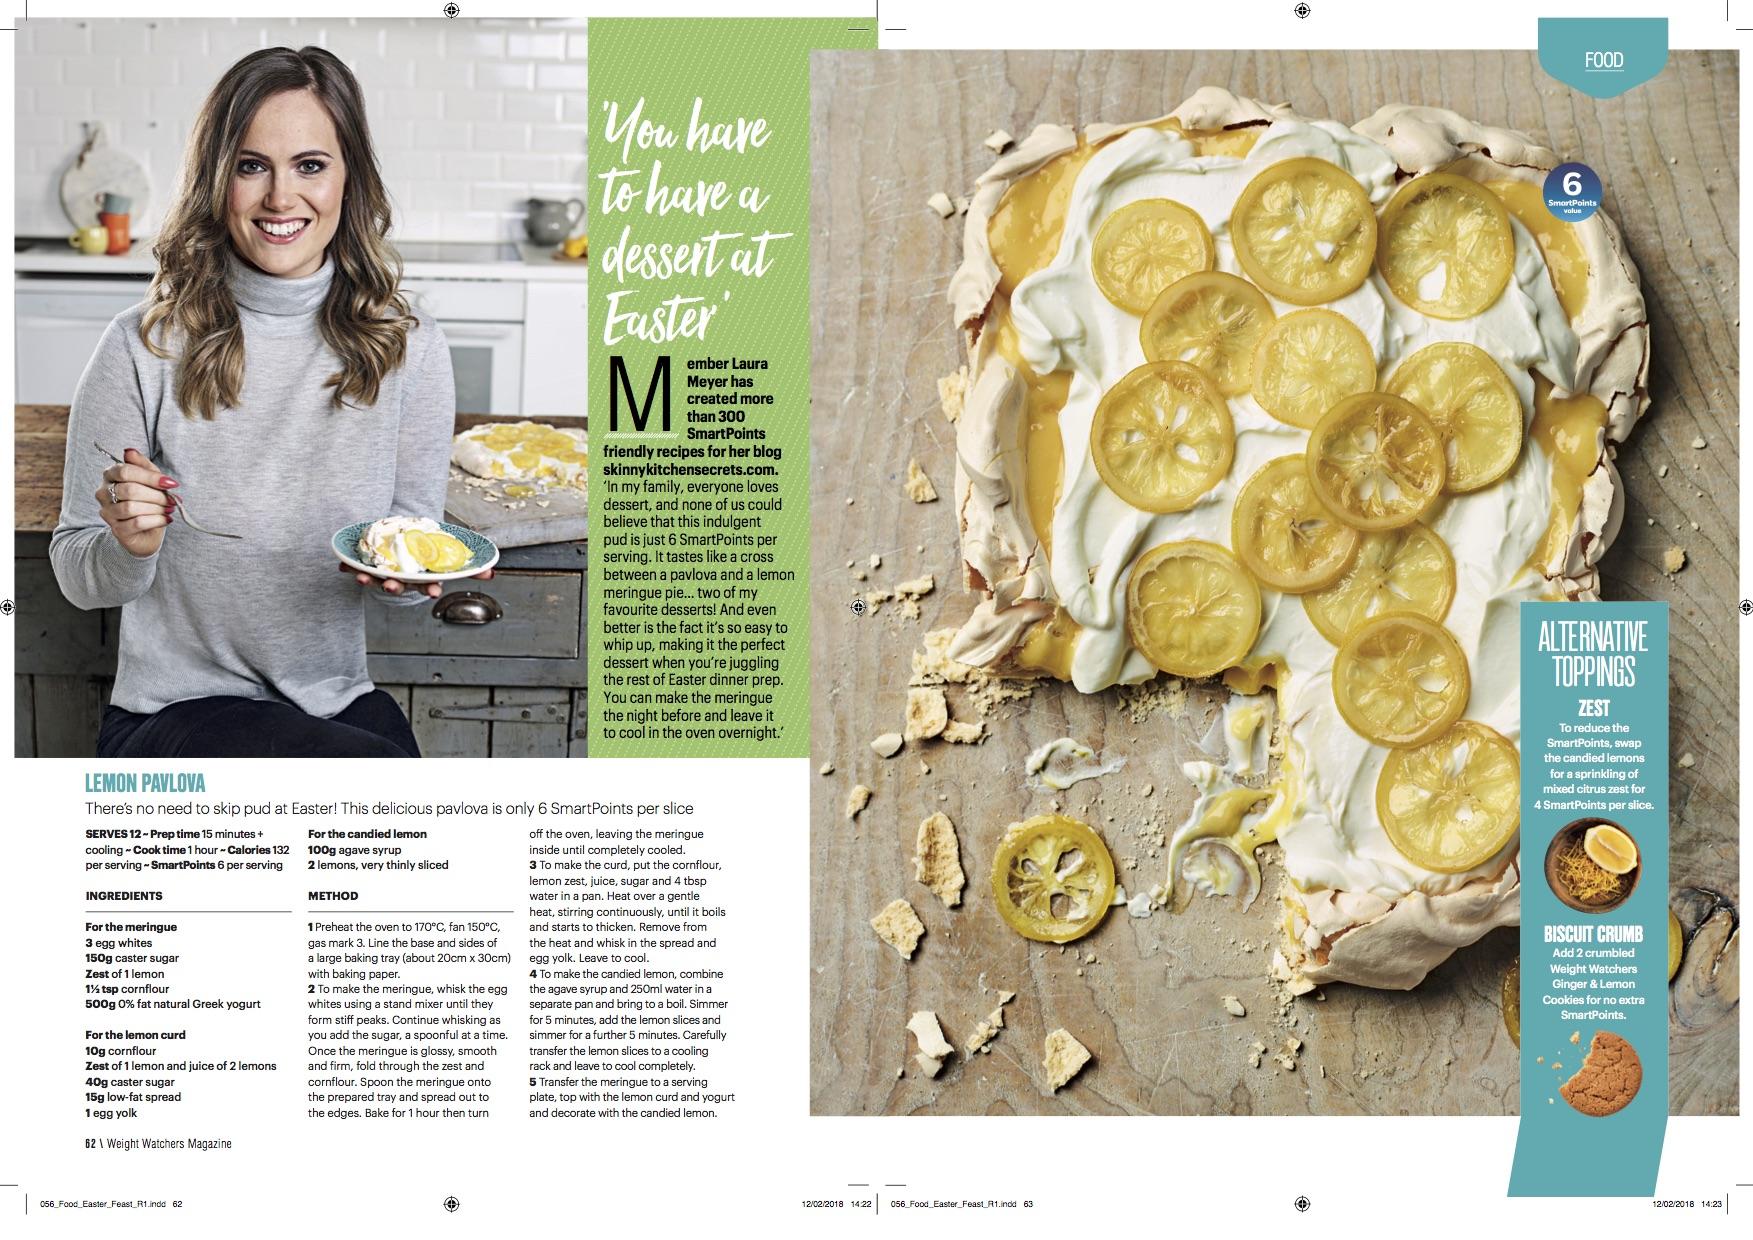 Publication: Weight Watchers magazine April 2018, Easter Feature  Photographer: Dan Jones  Food stylist: Polly Webb-Wilson  Prop stylist: Ginger Whisk